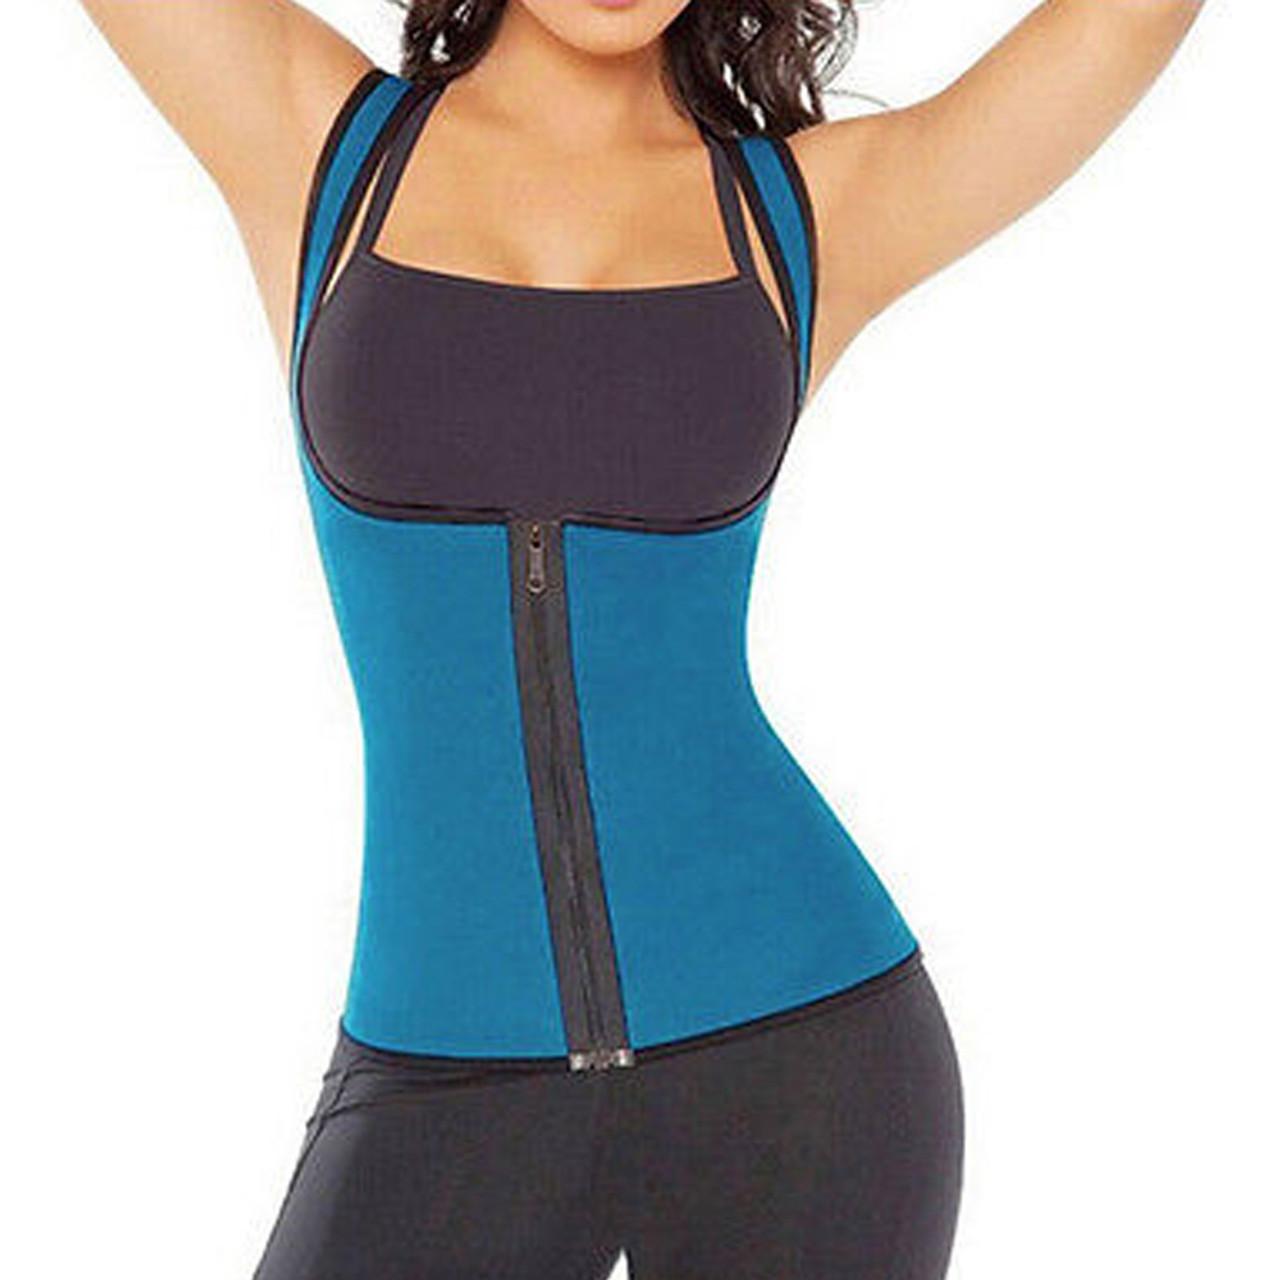 3e2054b517 Blue Waist Trainer Front Zipper for Women Neoprene Body Shaper for Gym  Workout Waist Training FREE Shipping. - www.kaneesha.com